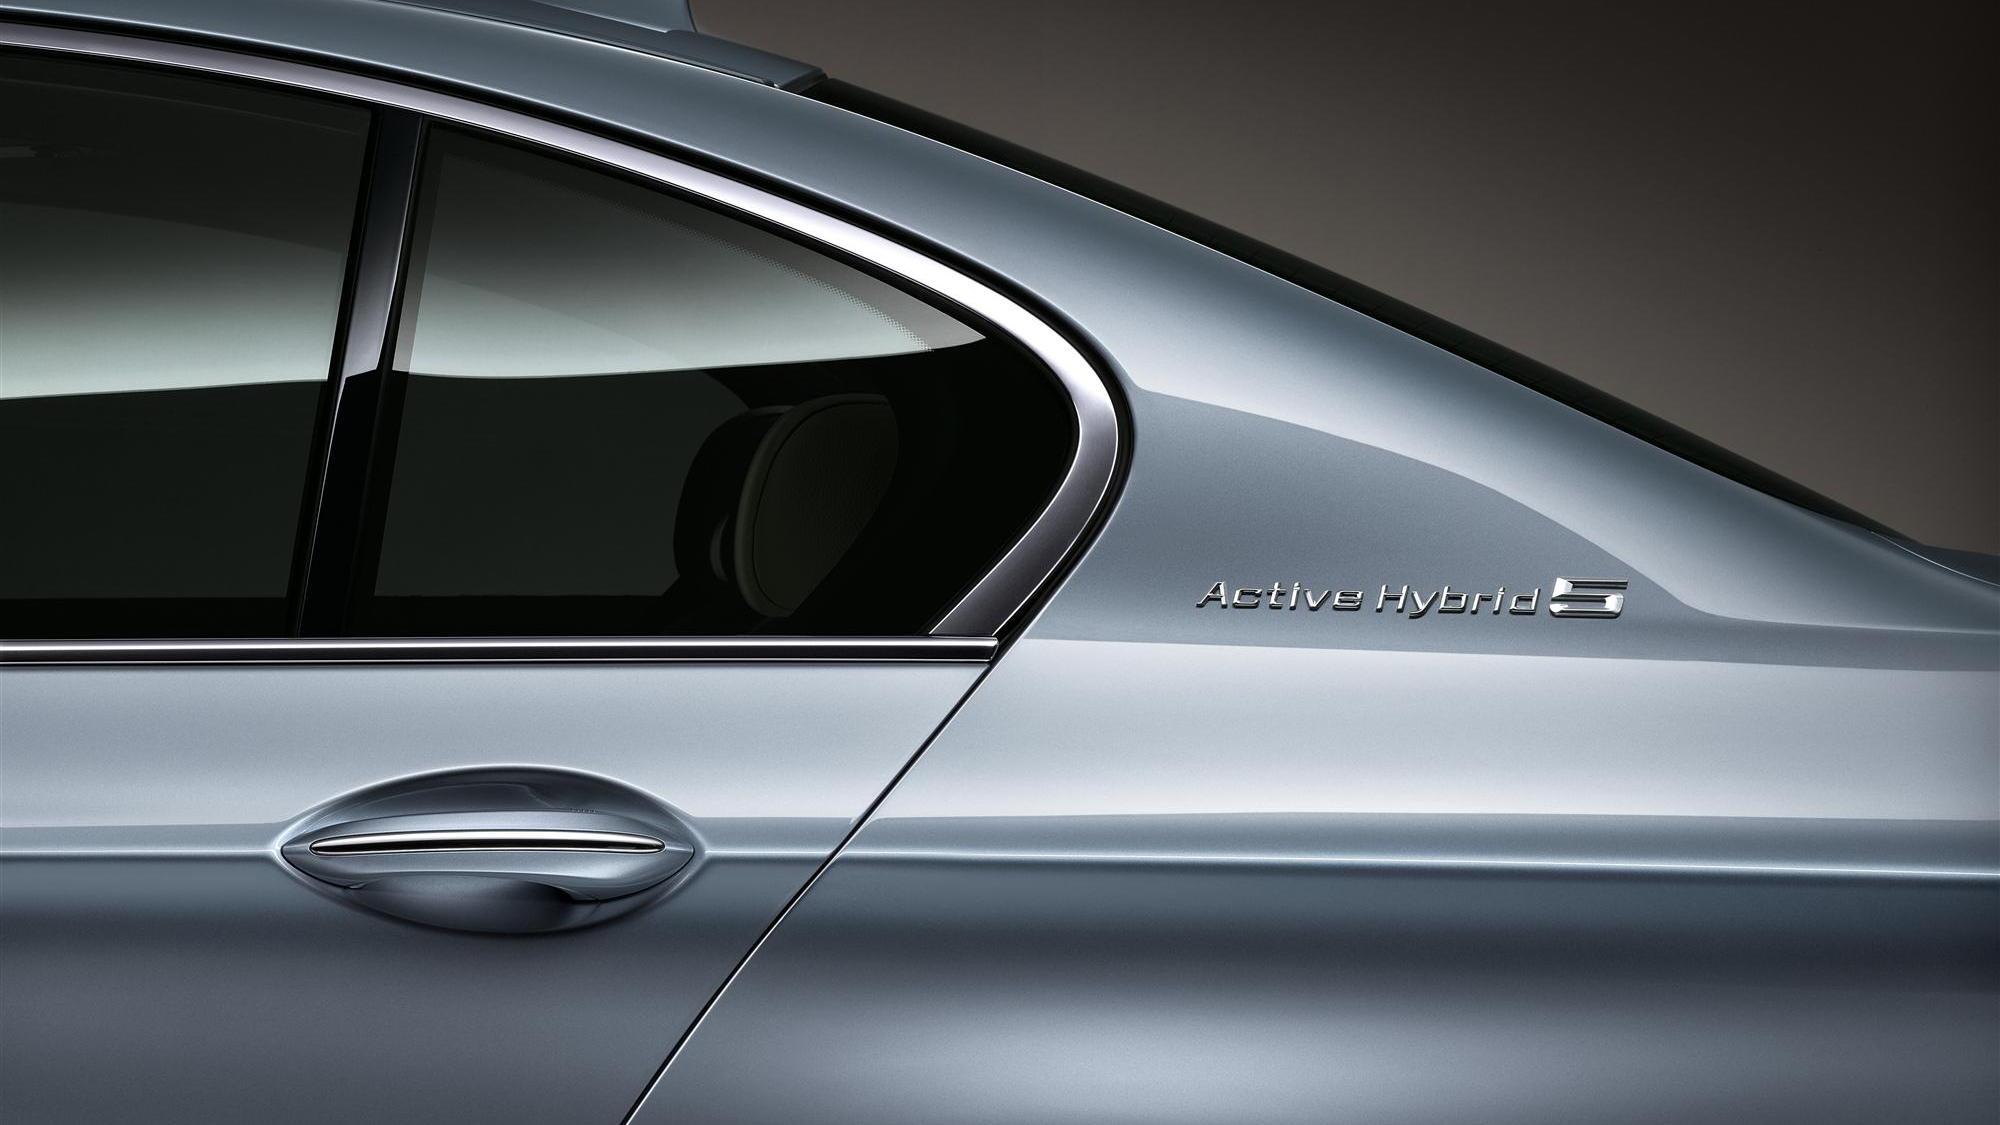 2012 BMW ActiveHybrid 5